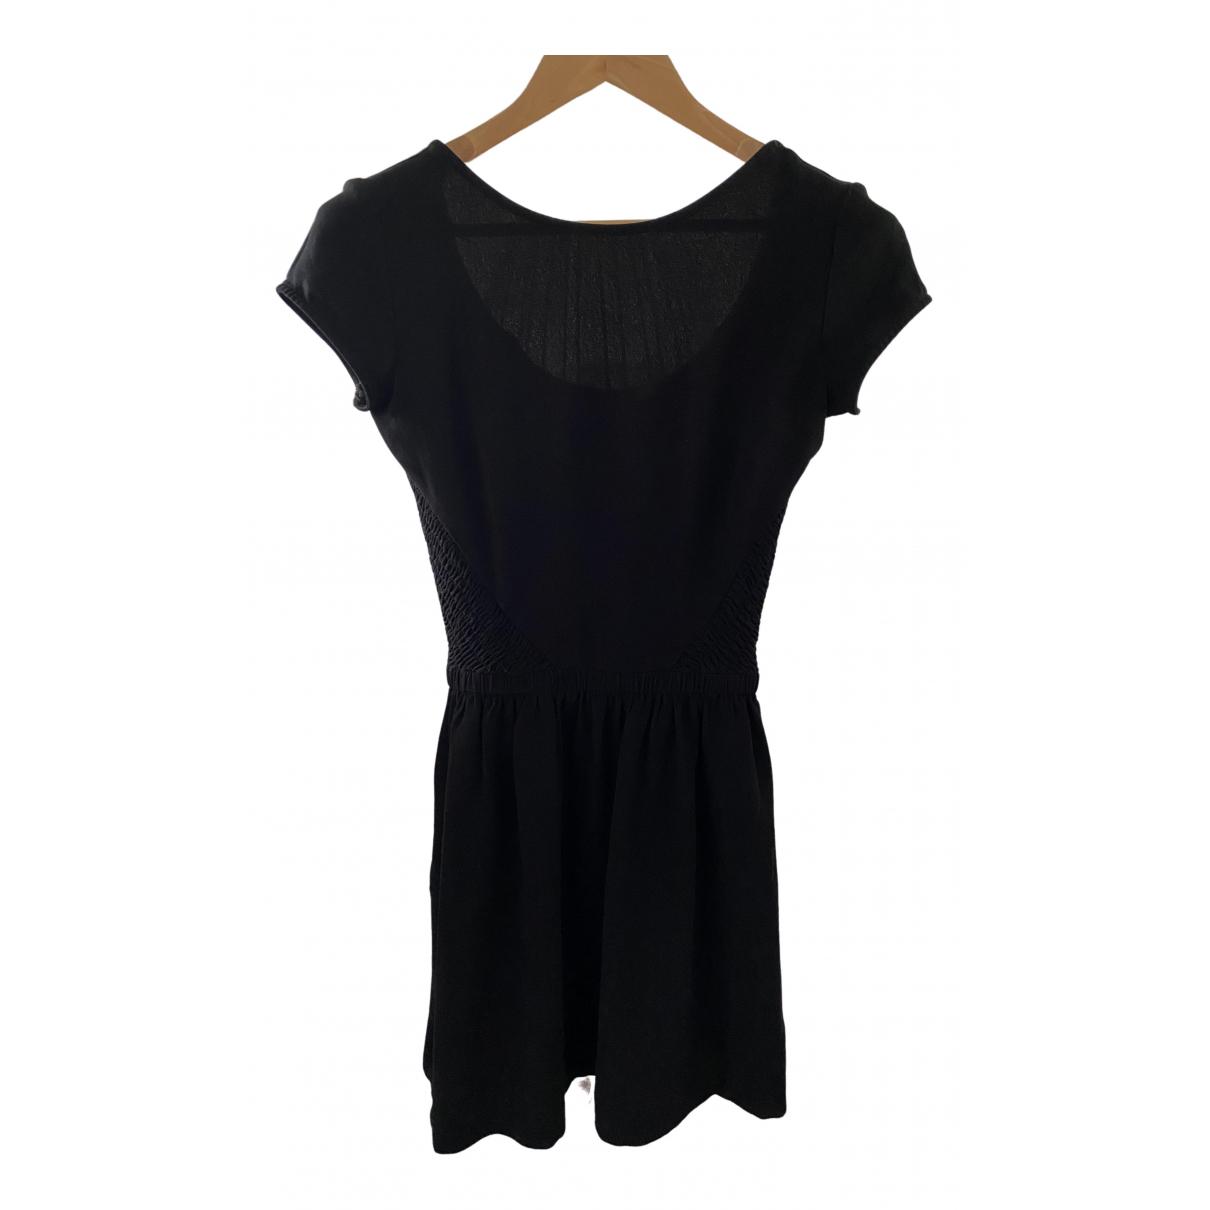 Maje \N Kleid in  Schwarz Polyester